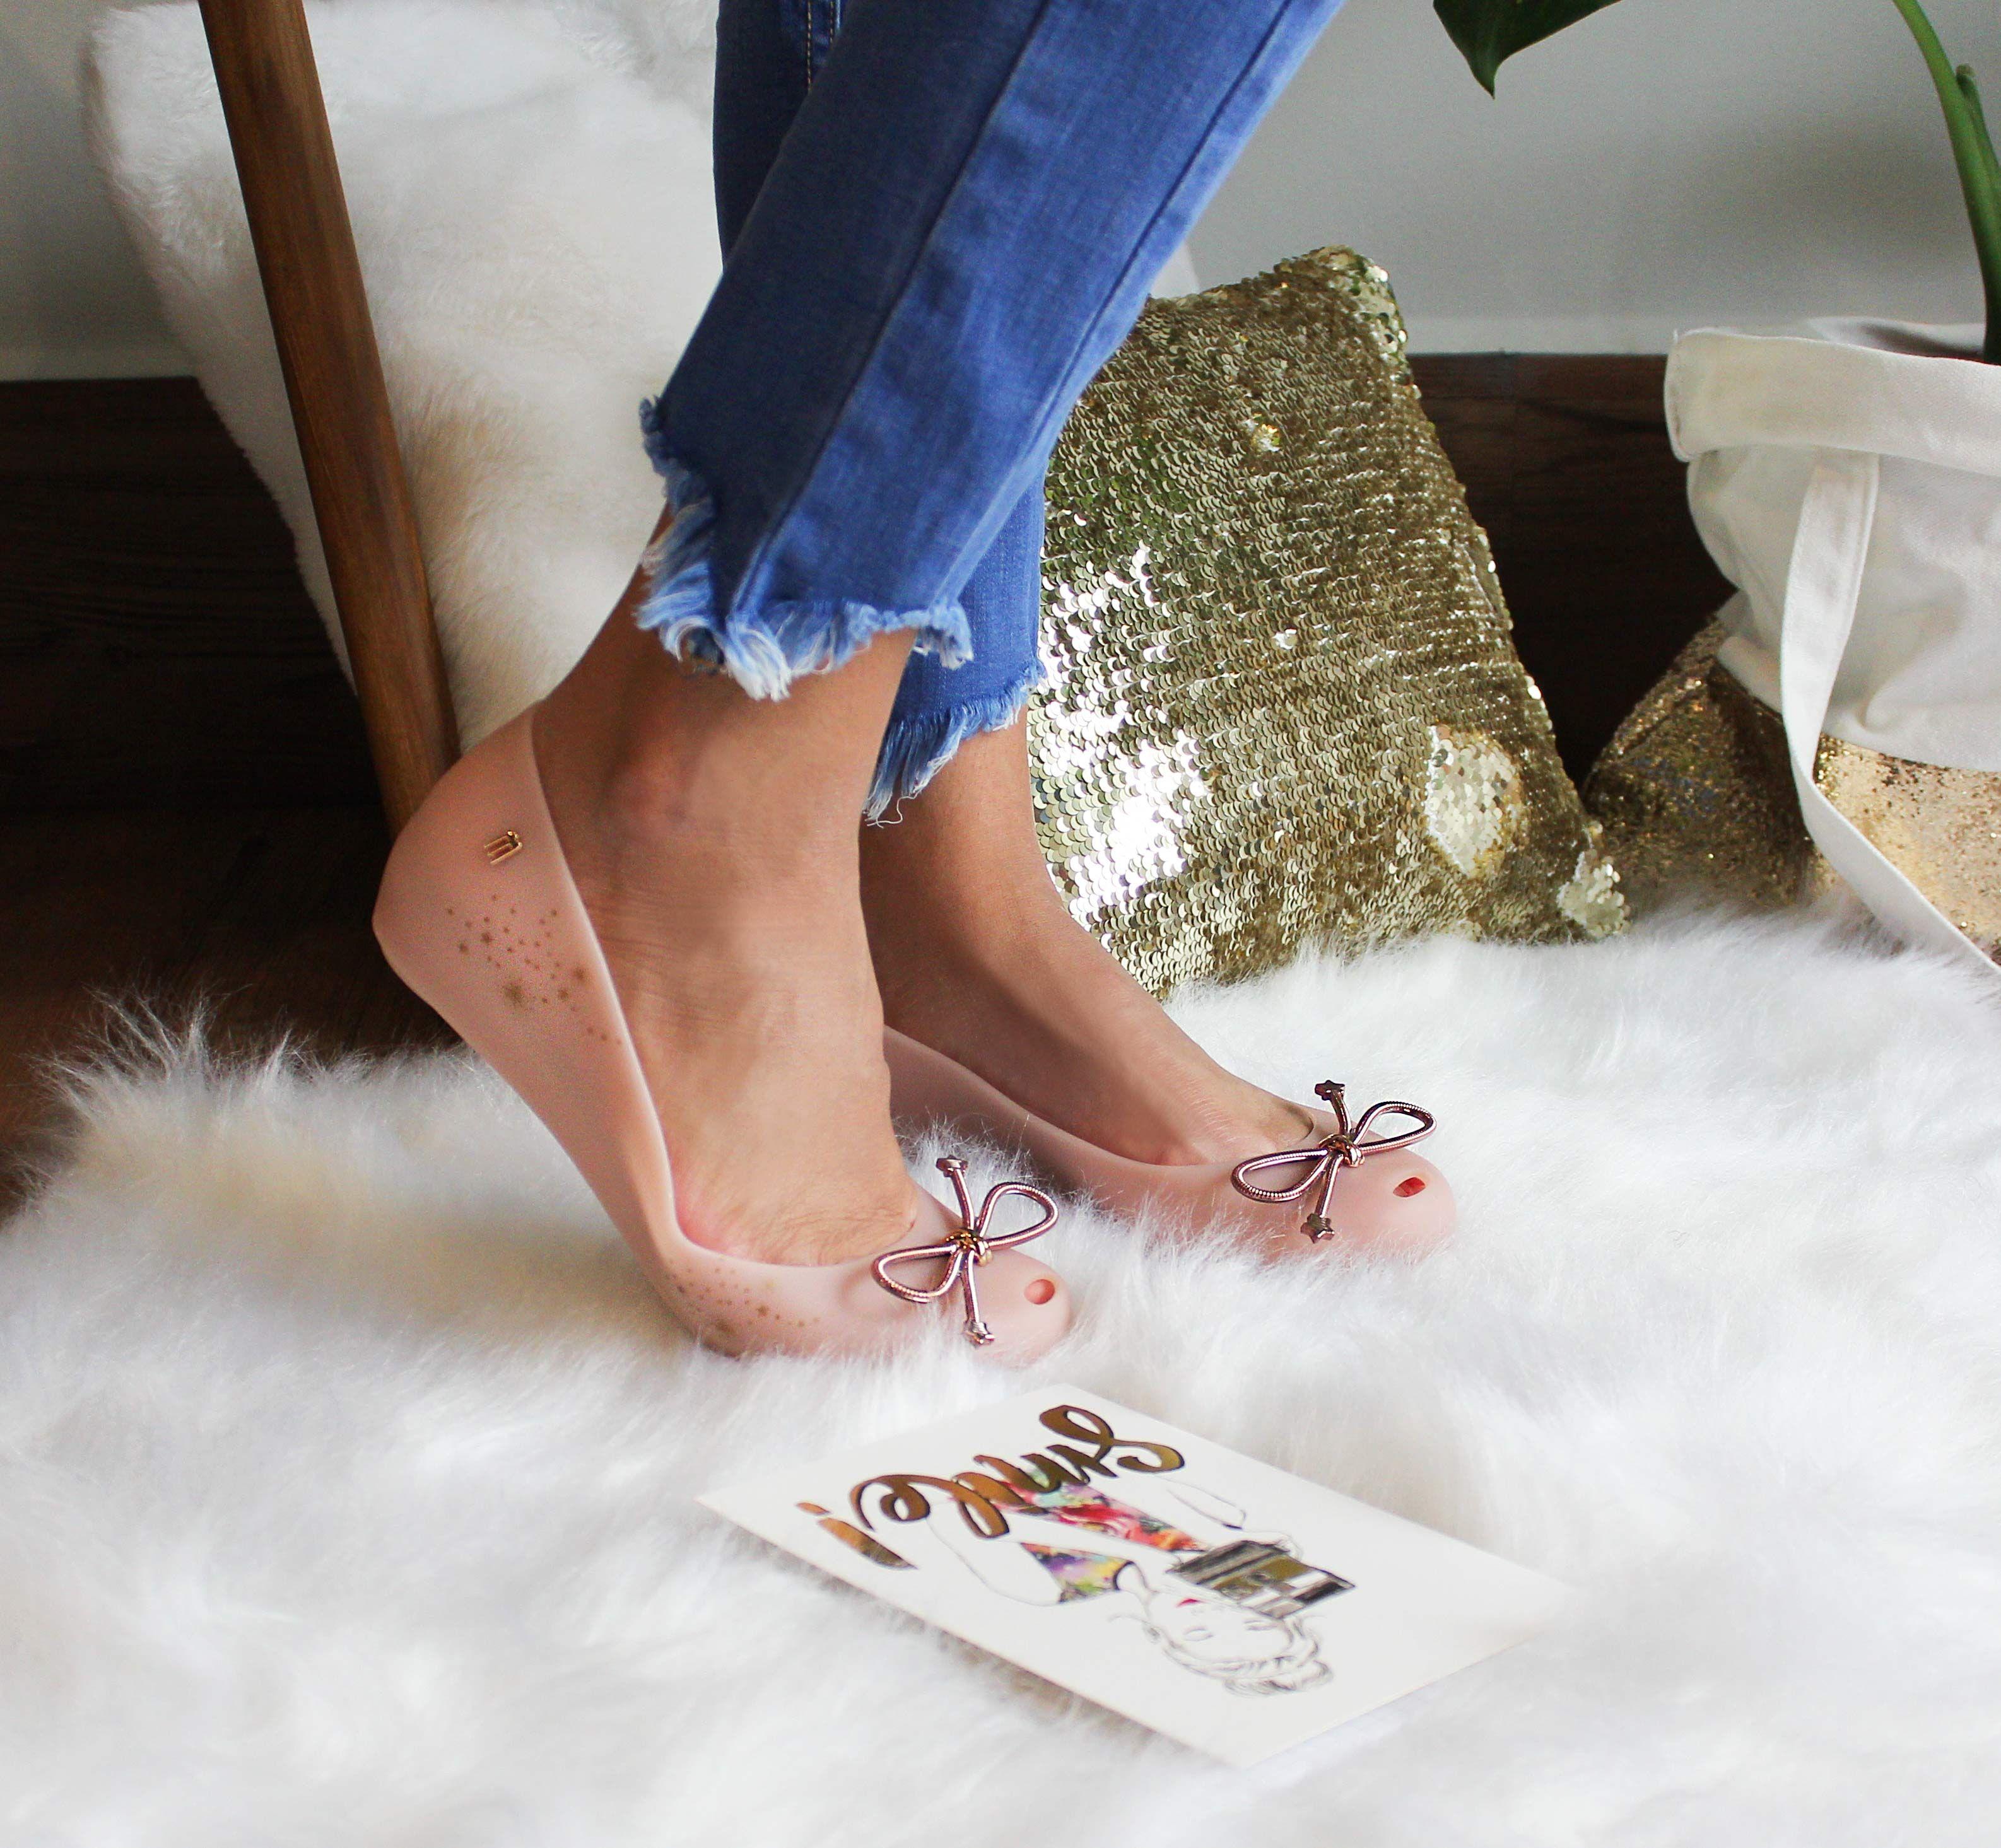 f3e3d25bb Melissa Elements - Open Vibes Tipos De Sapatos, Sapatos Femininos,  Tendências Da Moda,